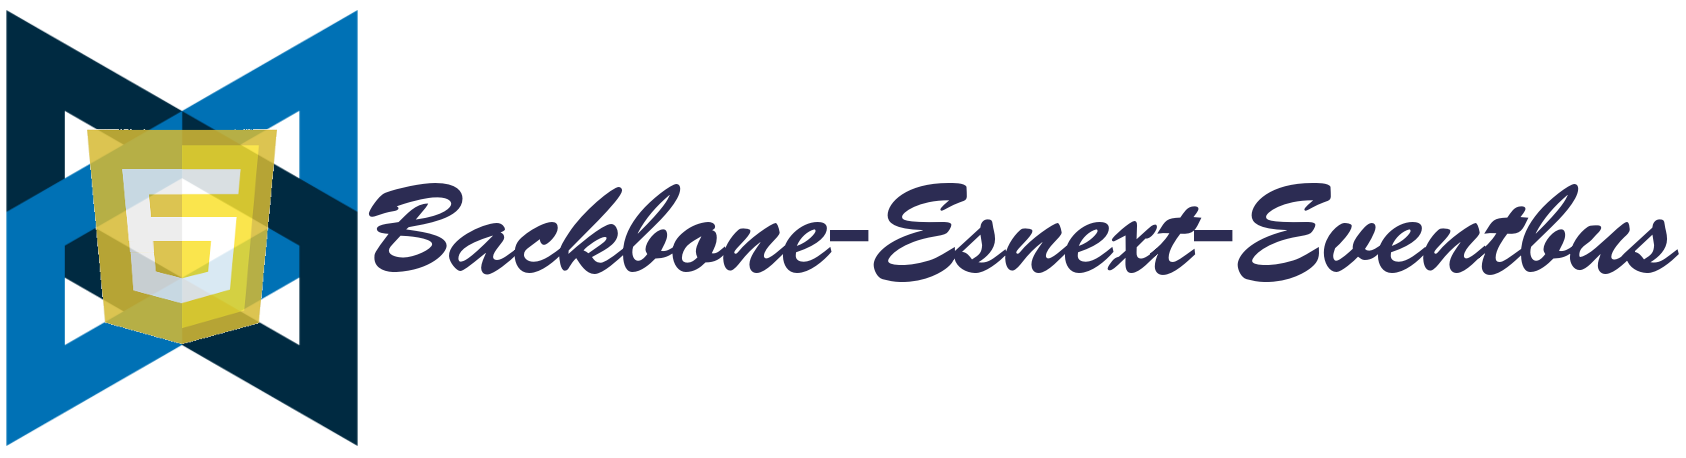 backbone-esnext-eventbus